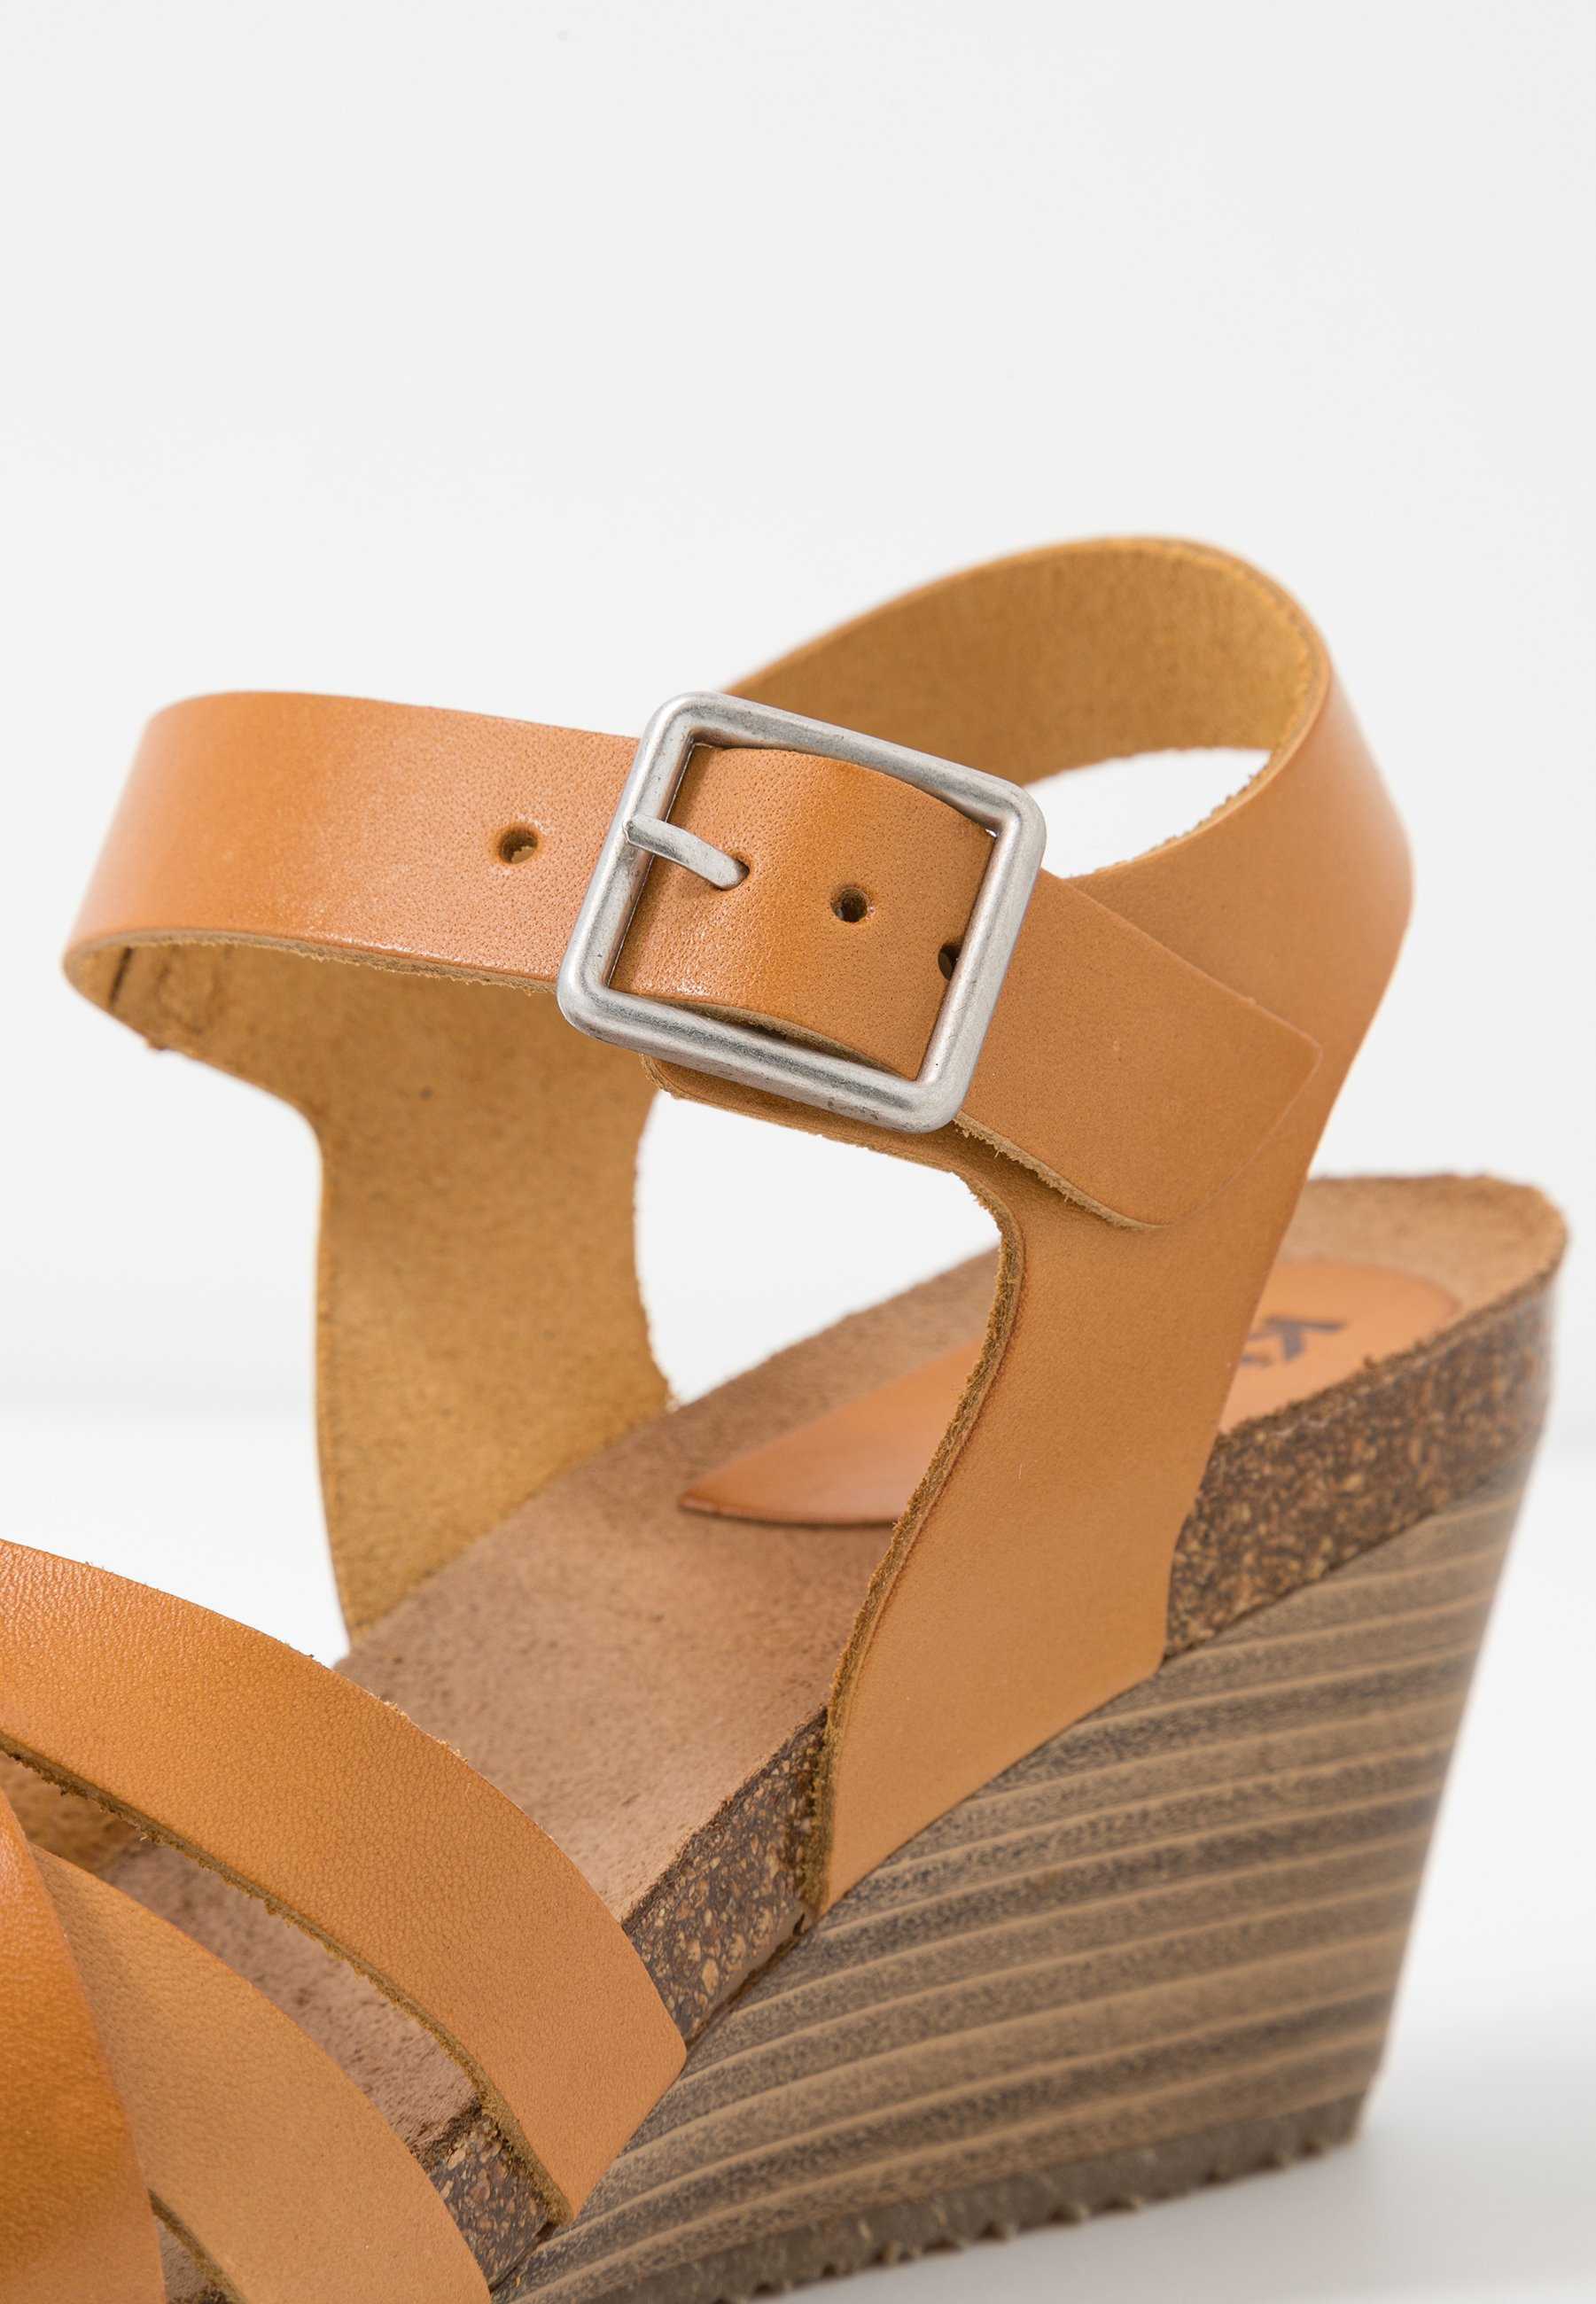 Kickers SOLYNA - Sandaletter med kilklack - jaune safran